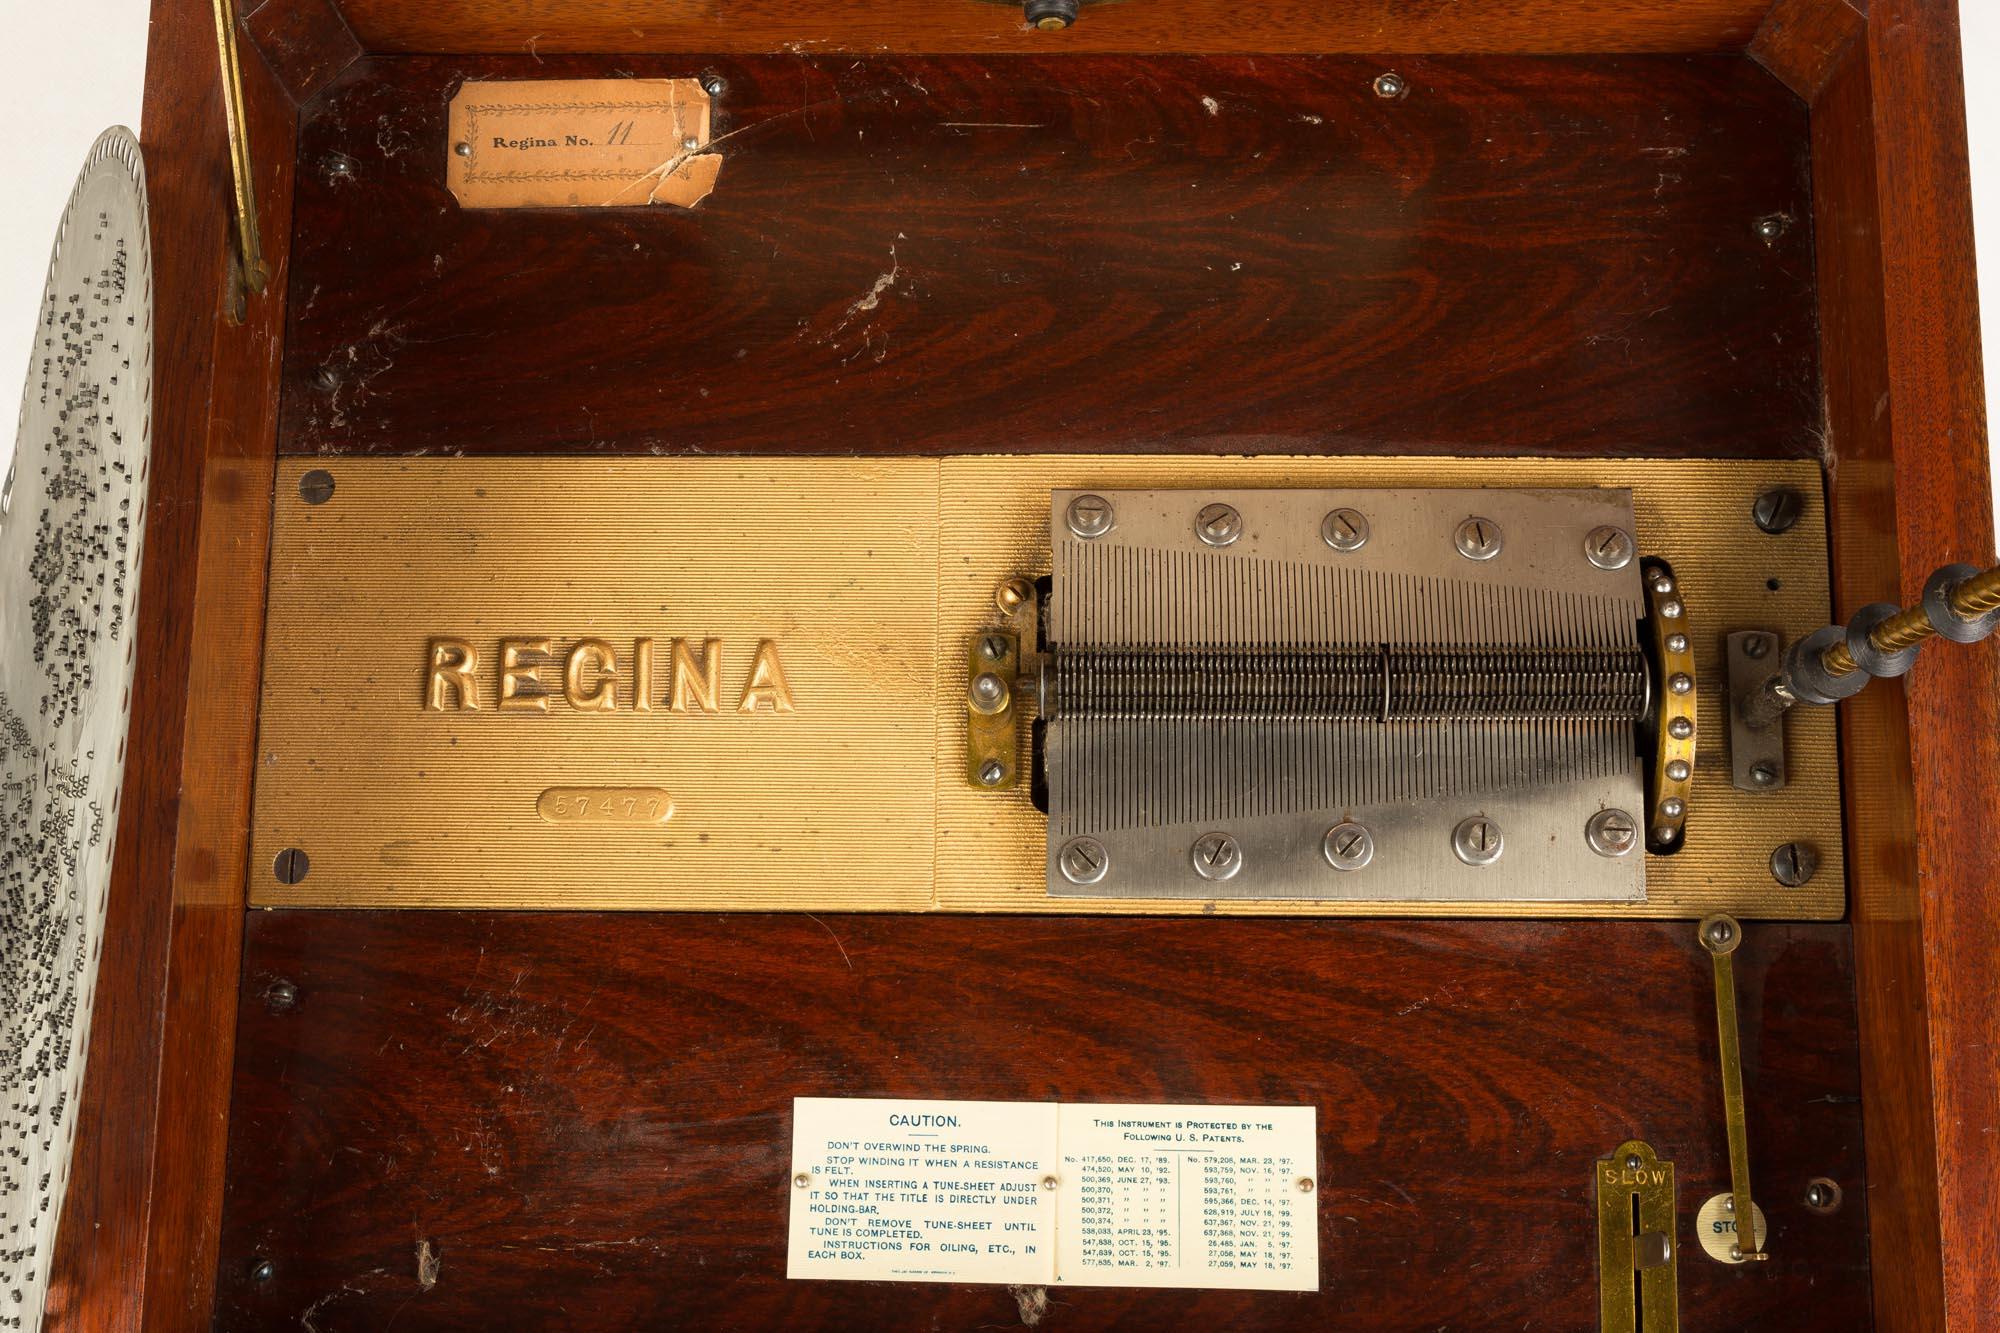 "Lot 218 - Regina Double Comb Music Box. circa 1900. (11) 15 1/2"" disks. Inlaid mahogany case. Working order."